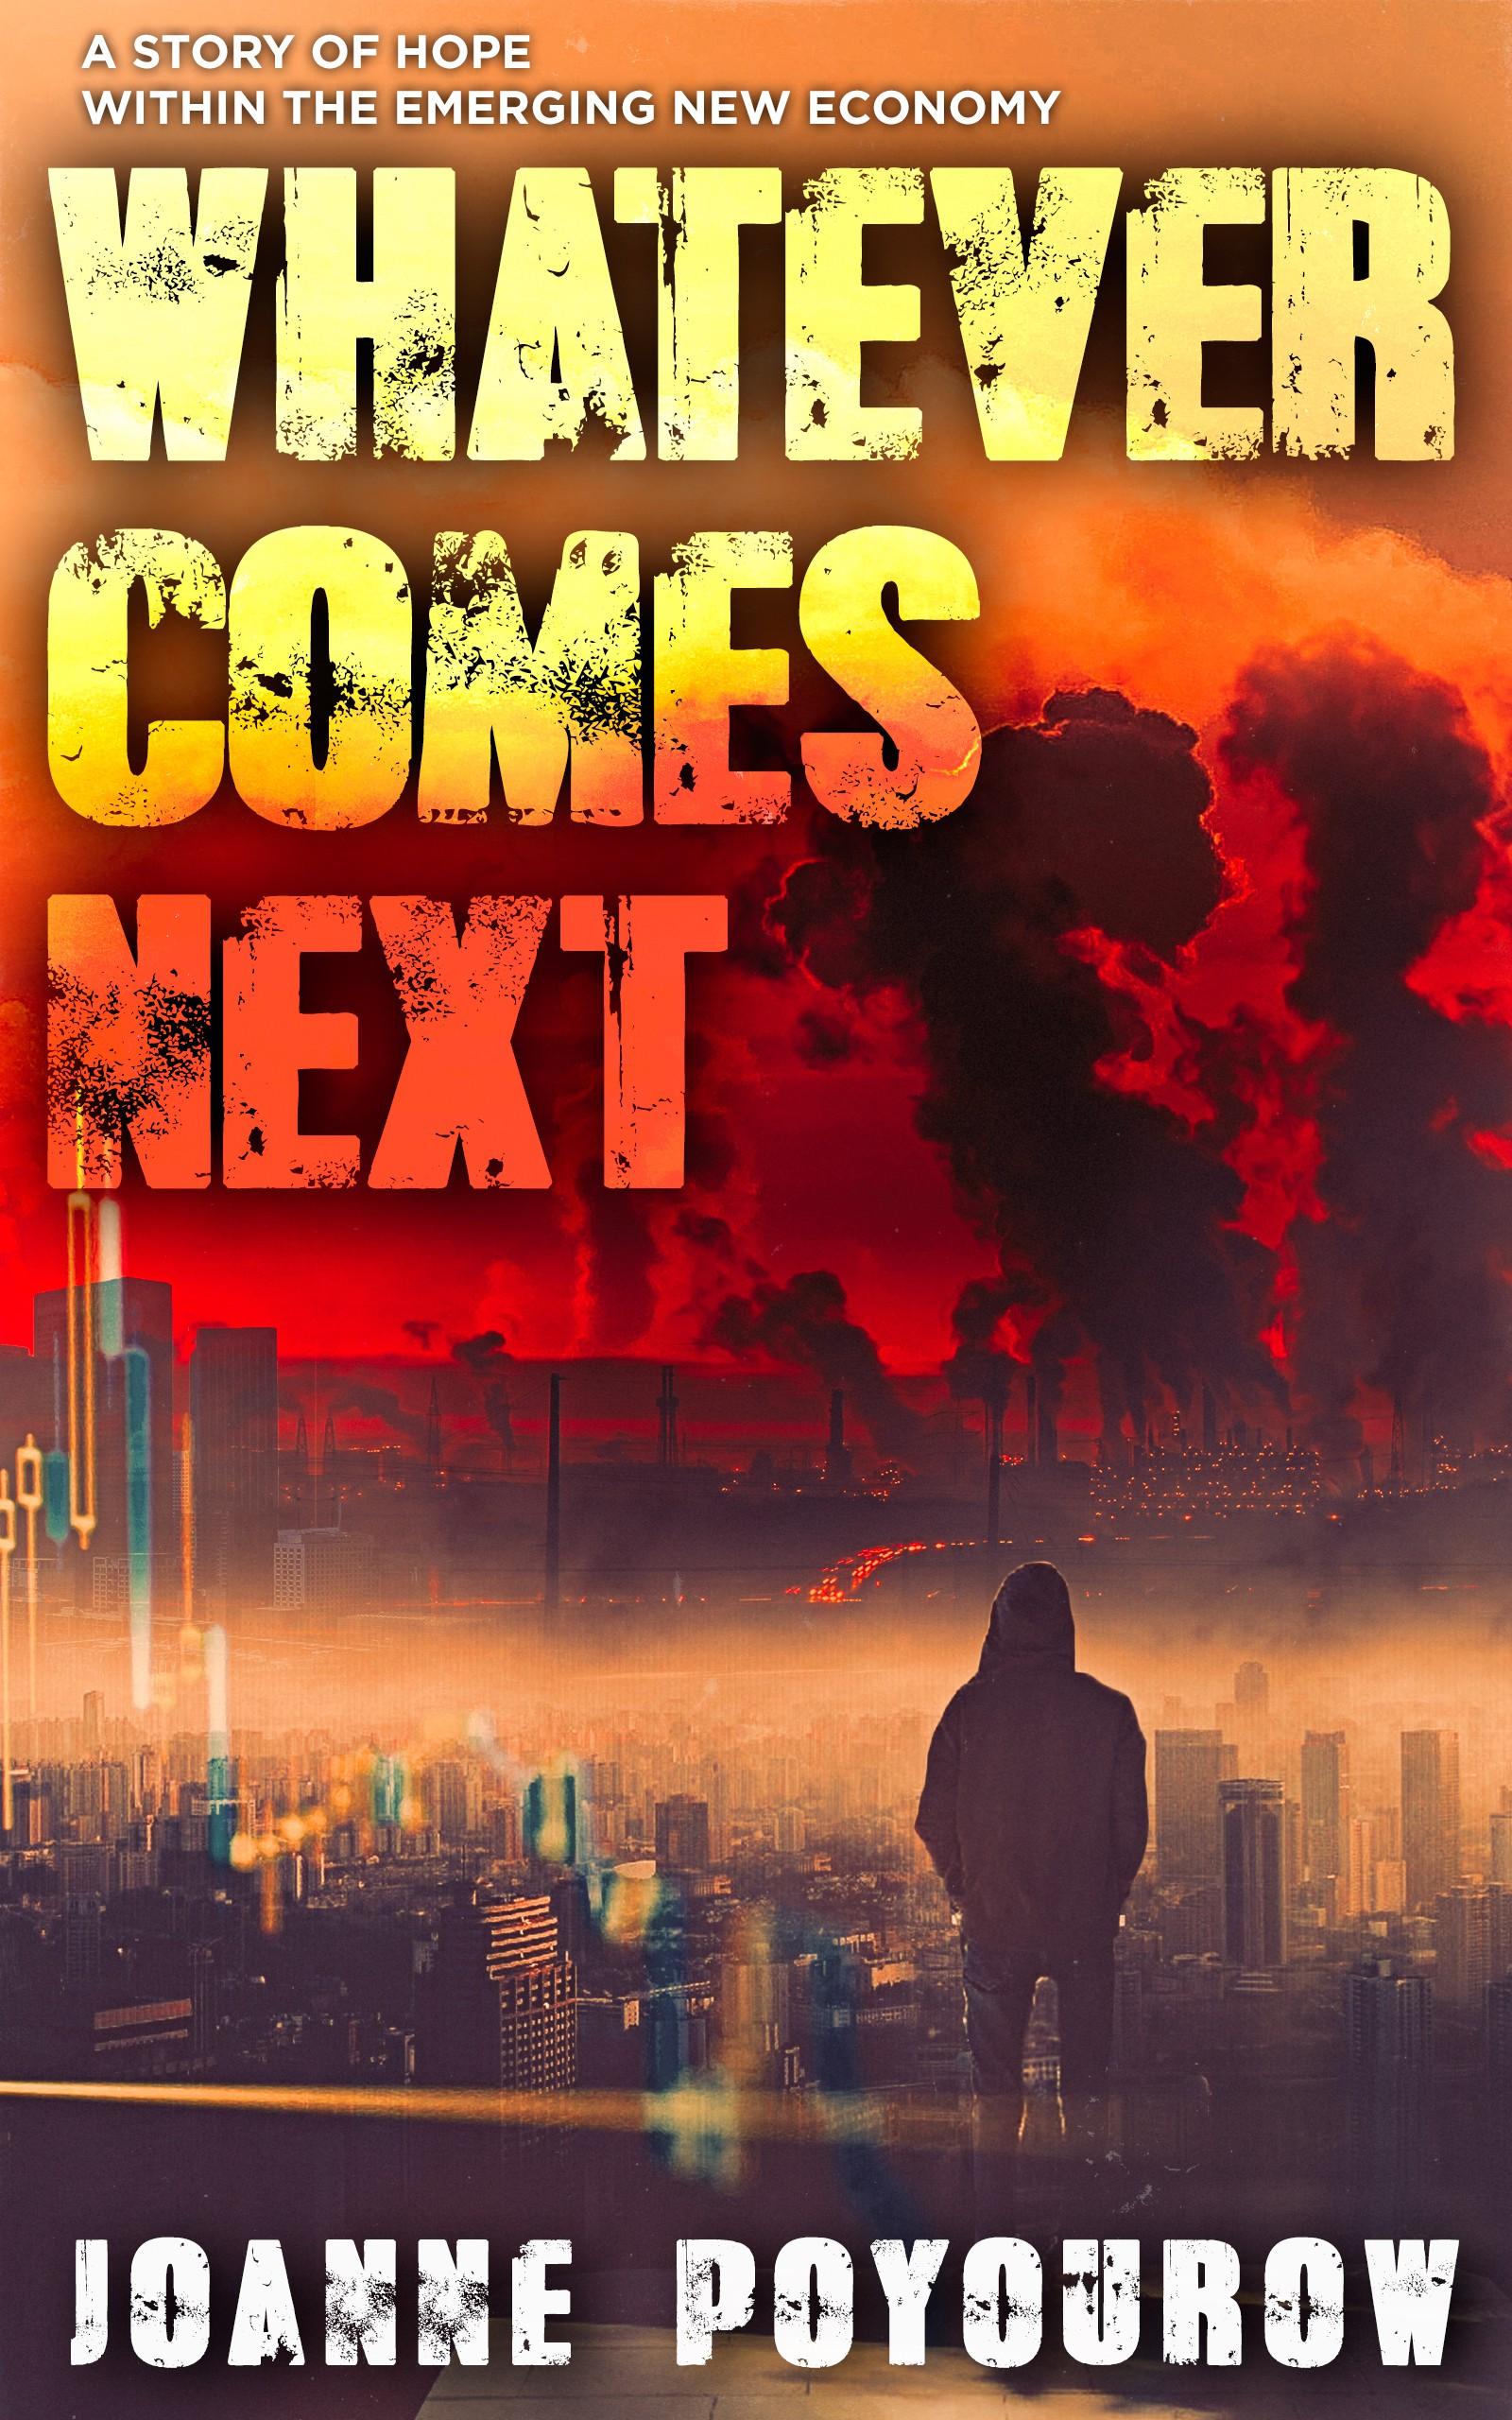 Design a thrilling cover for a political/environmental ebook